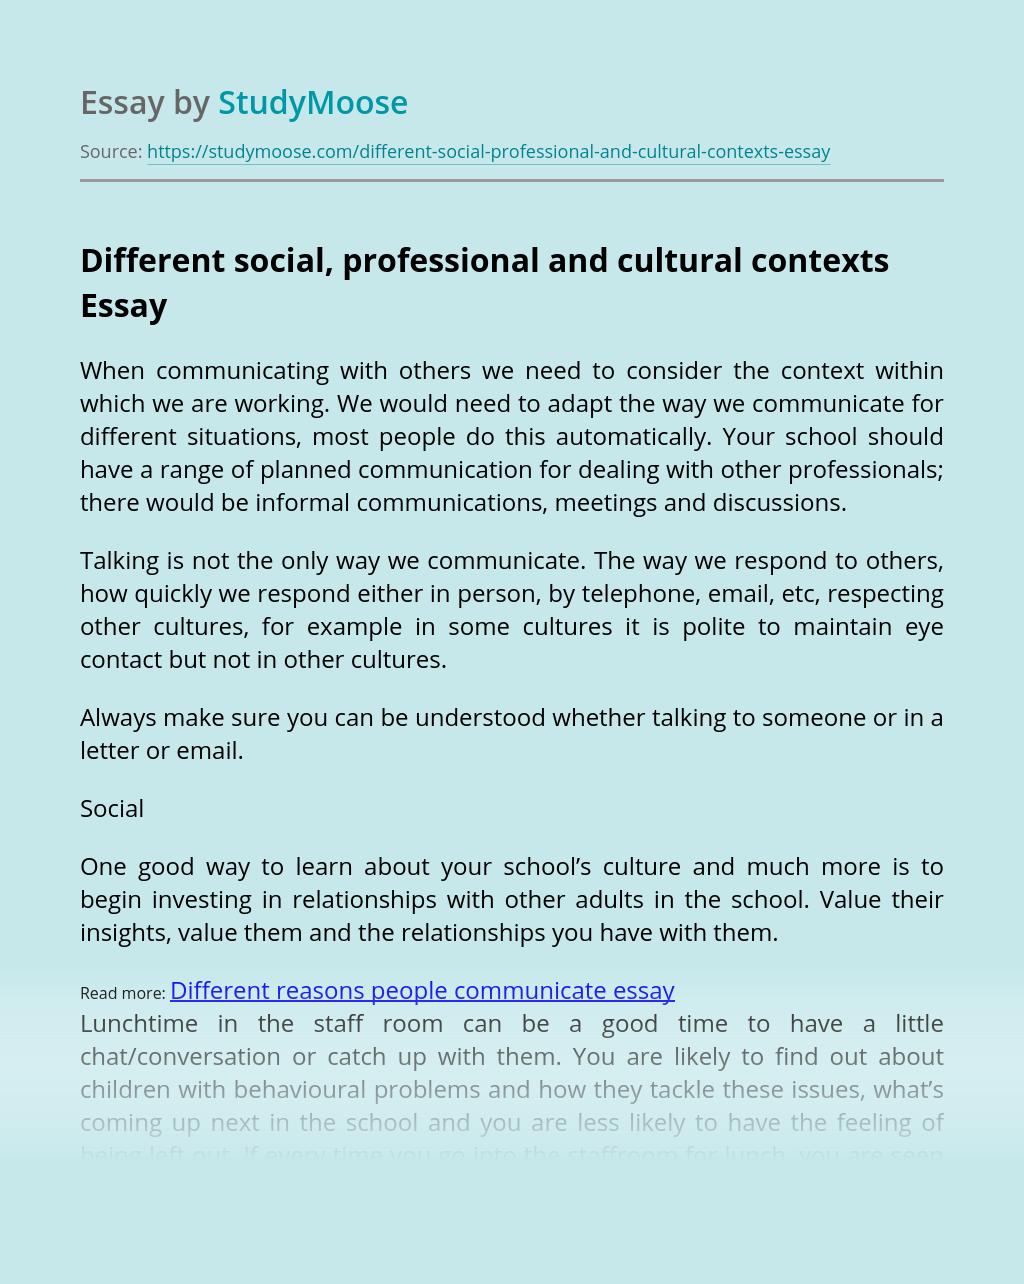 Different Social, Professional and Cultural Contexts